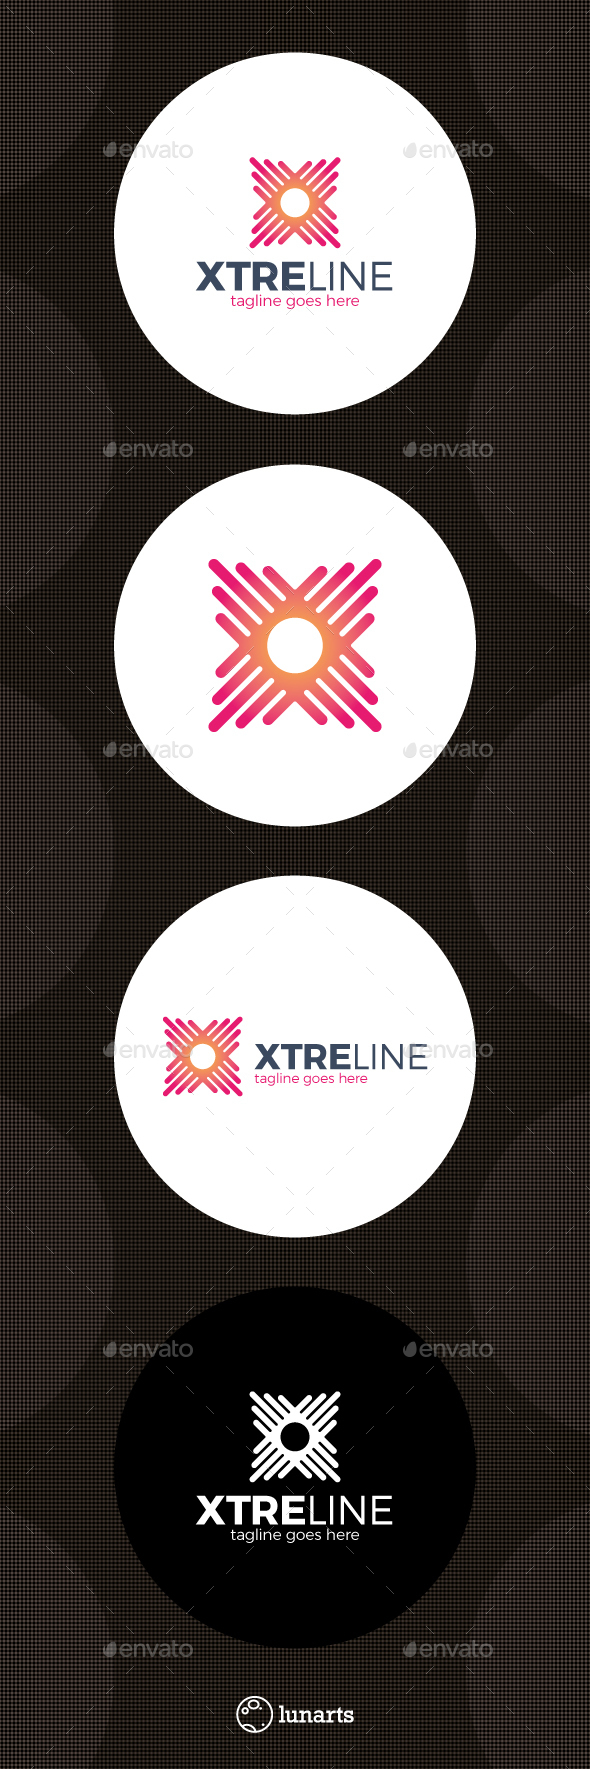 Xtreme Line Logo - Letter X